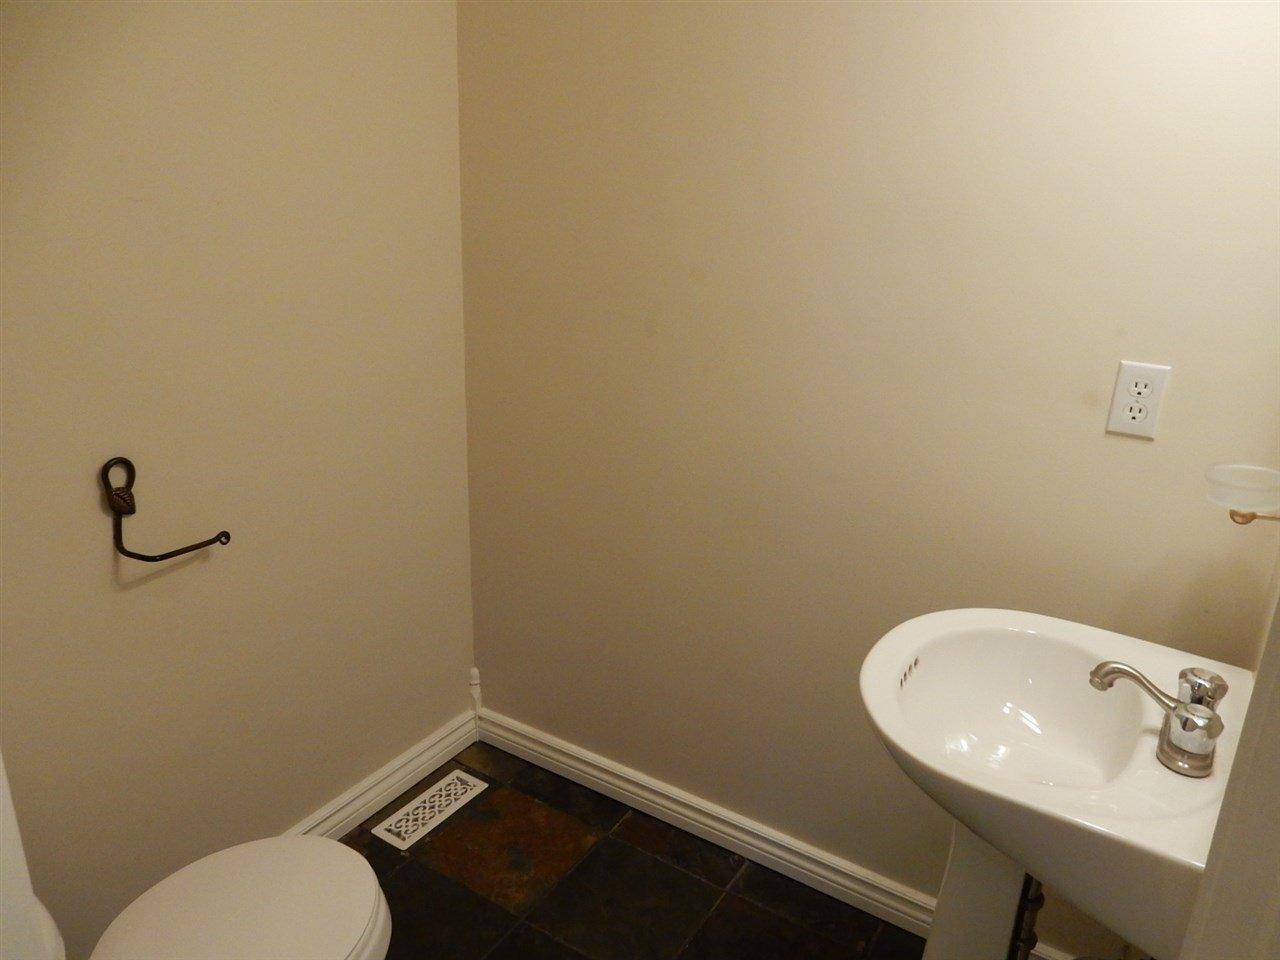 Photo 4: Photos: 3443 McKay Lane in Edmonton: Zone 55 House Half Duplex for sale : MLS®# E4173243